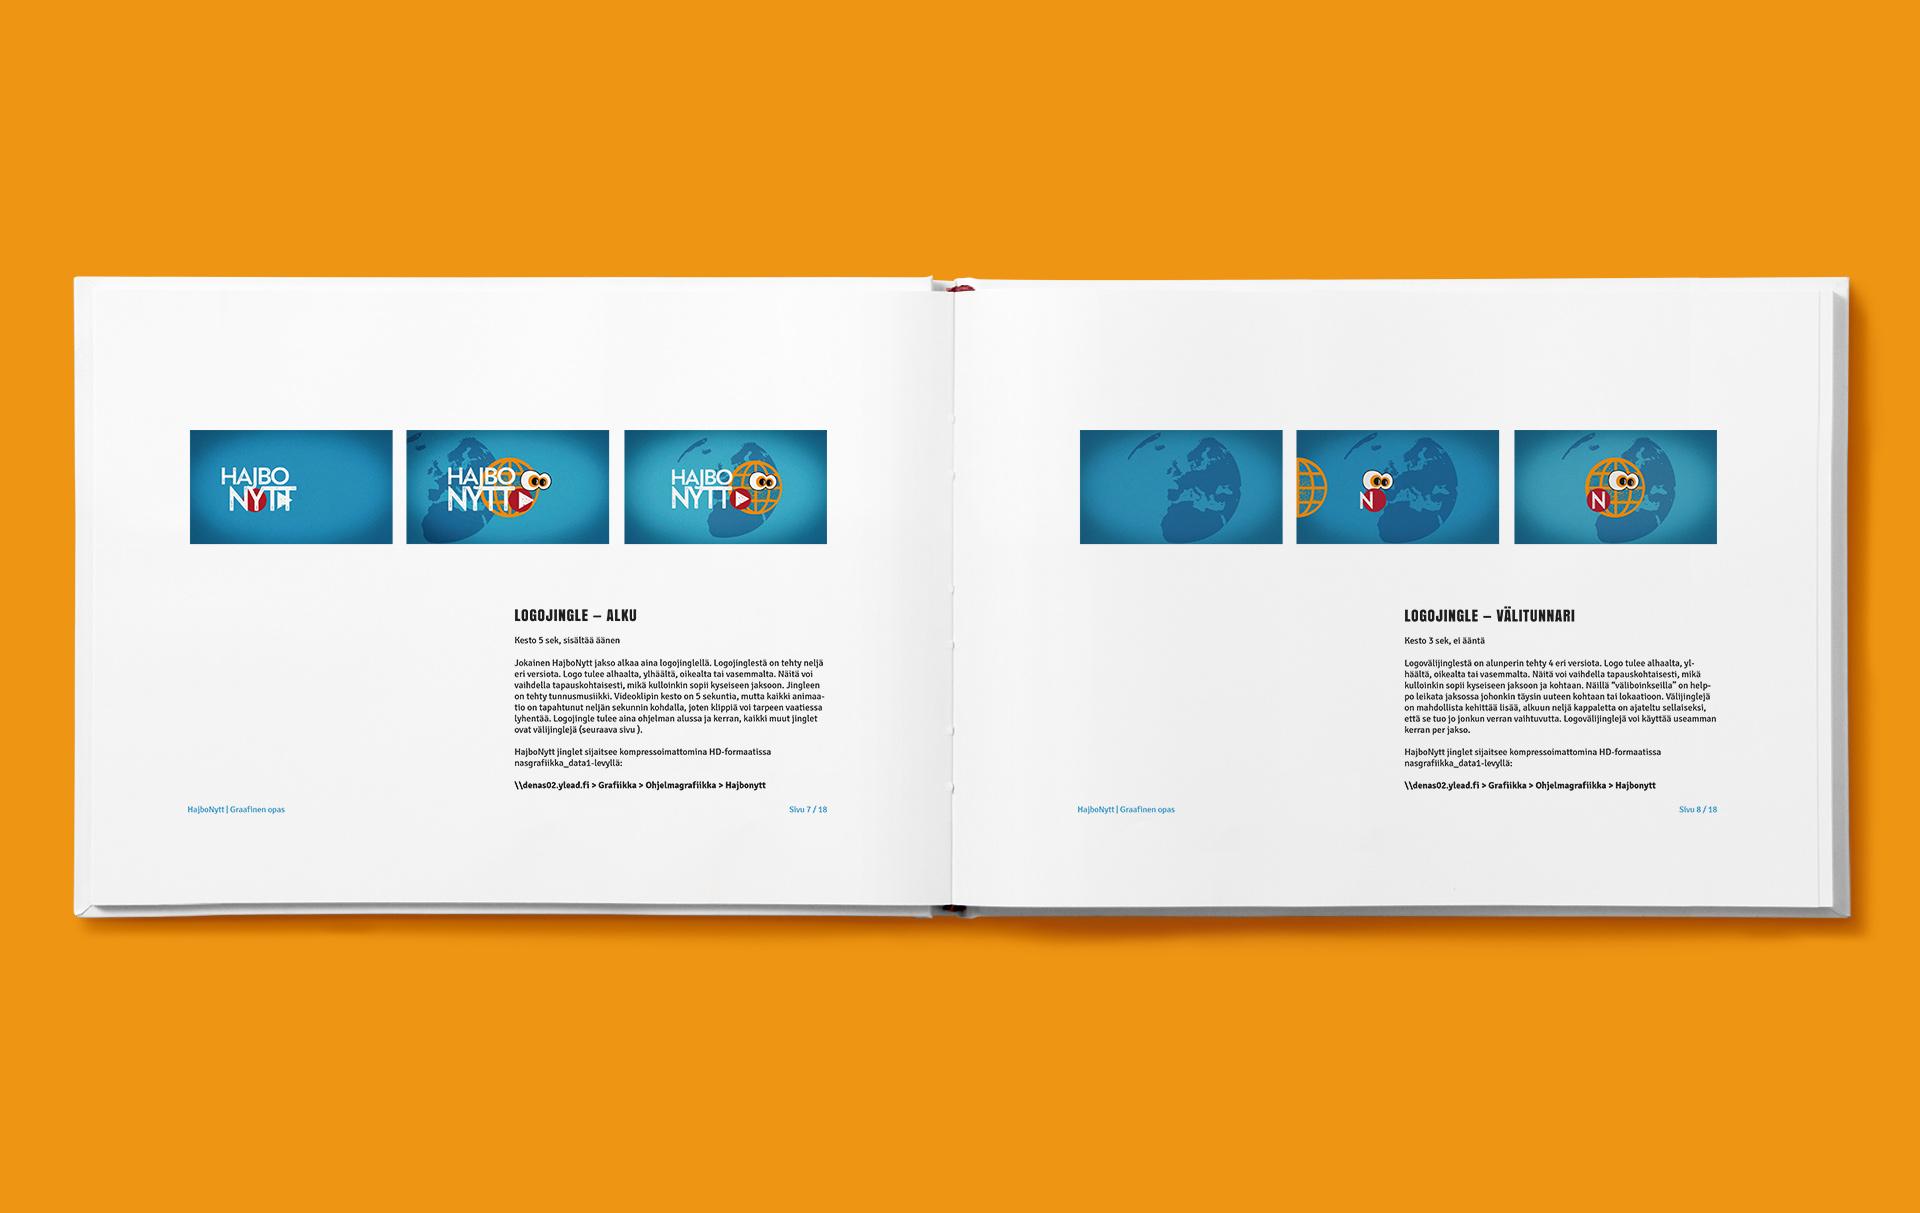 HajboNytt-graafOhje-Kirja-Rajattu3.jpg